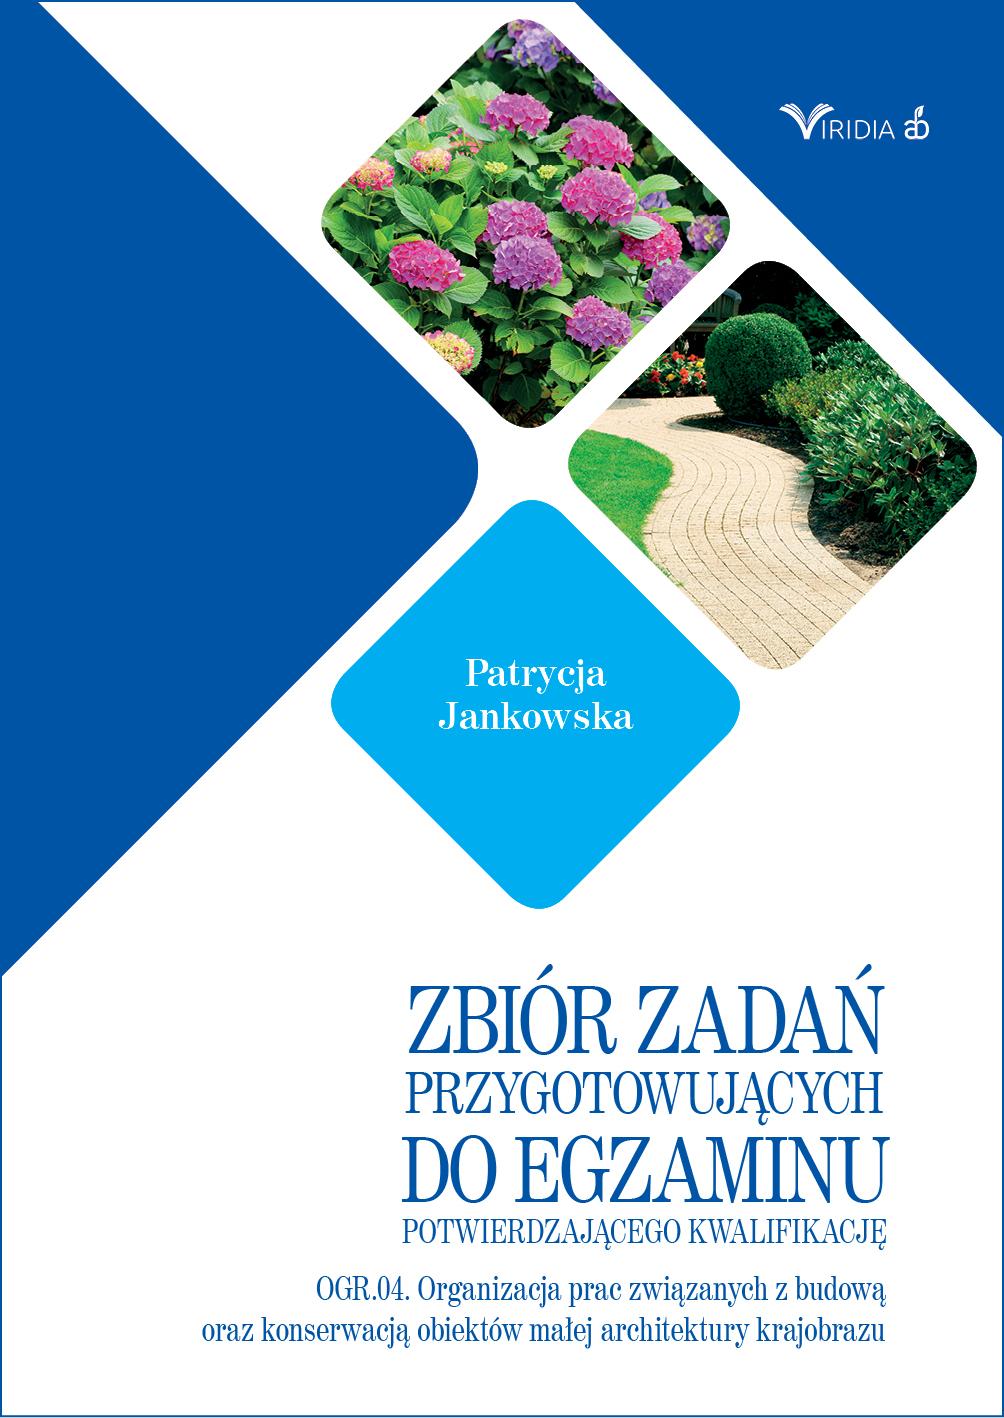 zbior_zadan_ogr_04_okladka